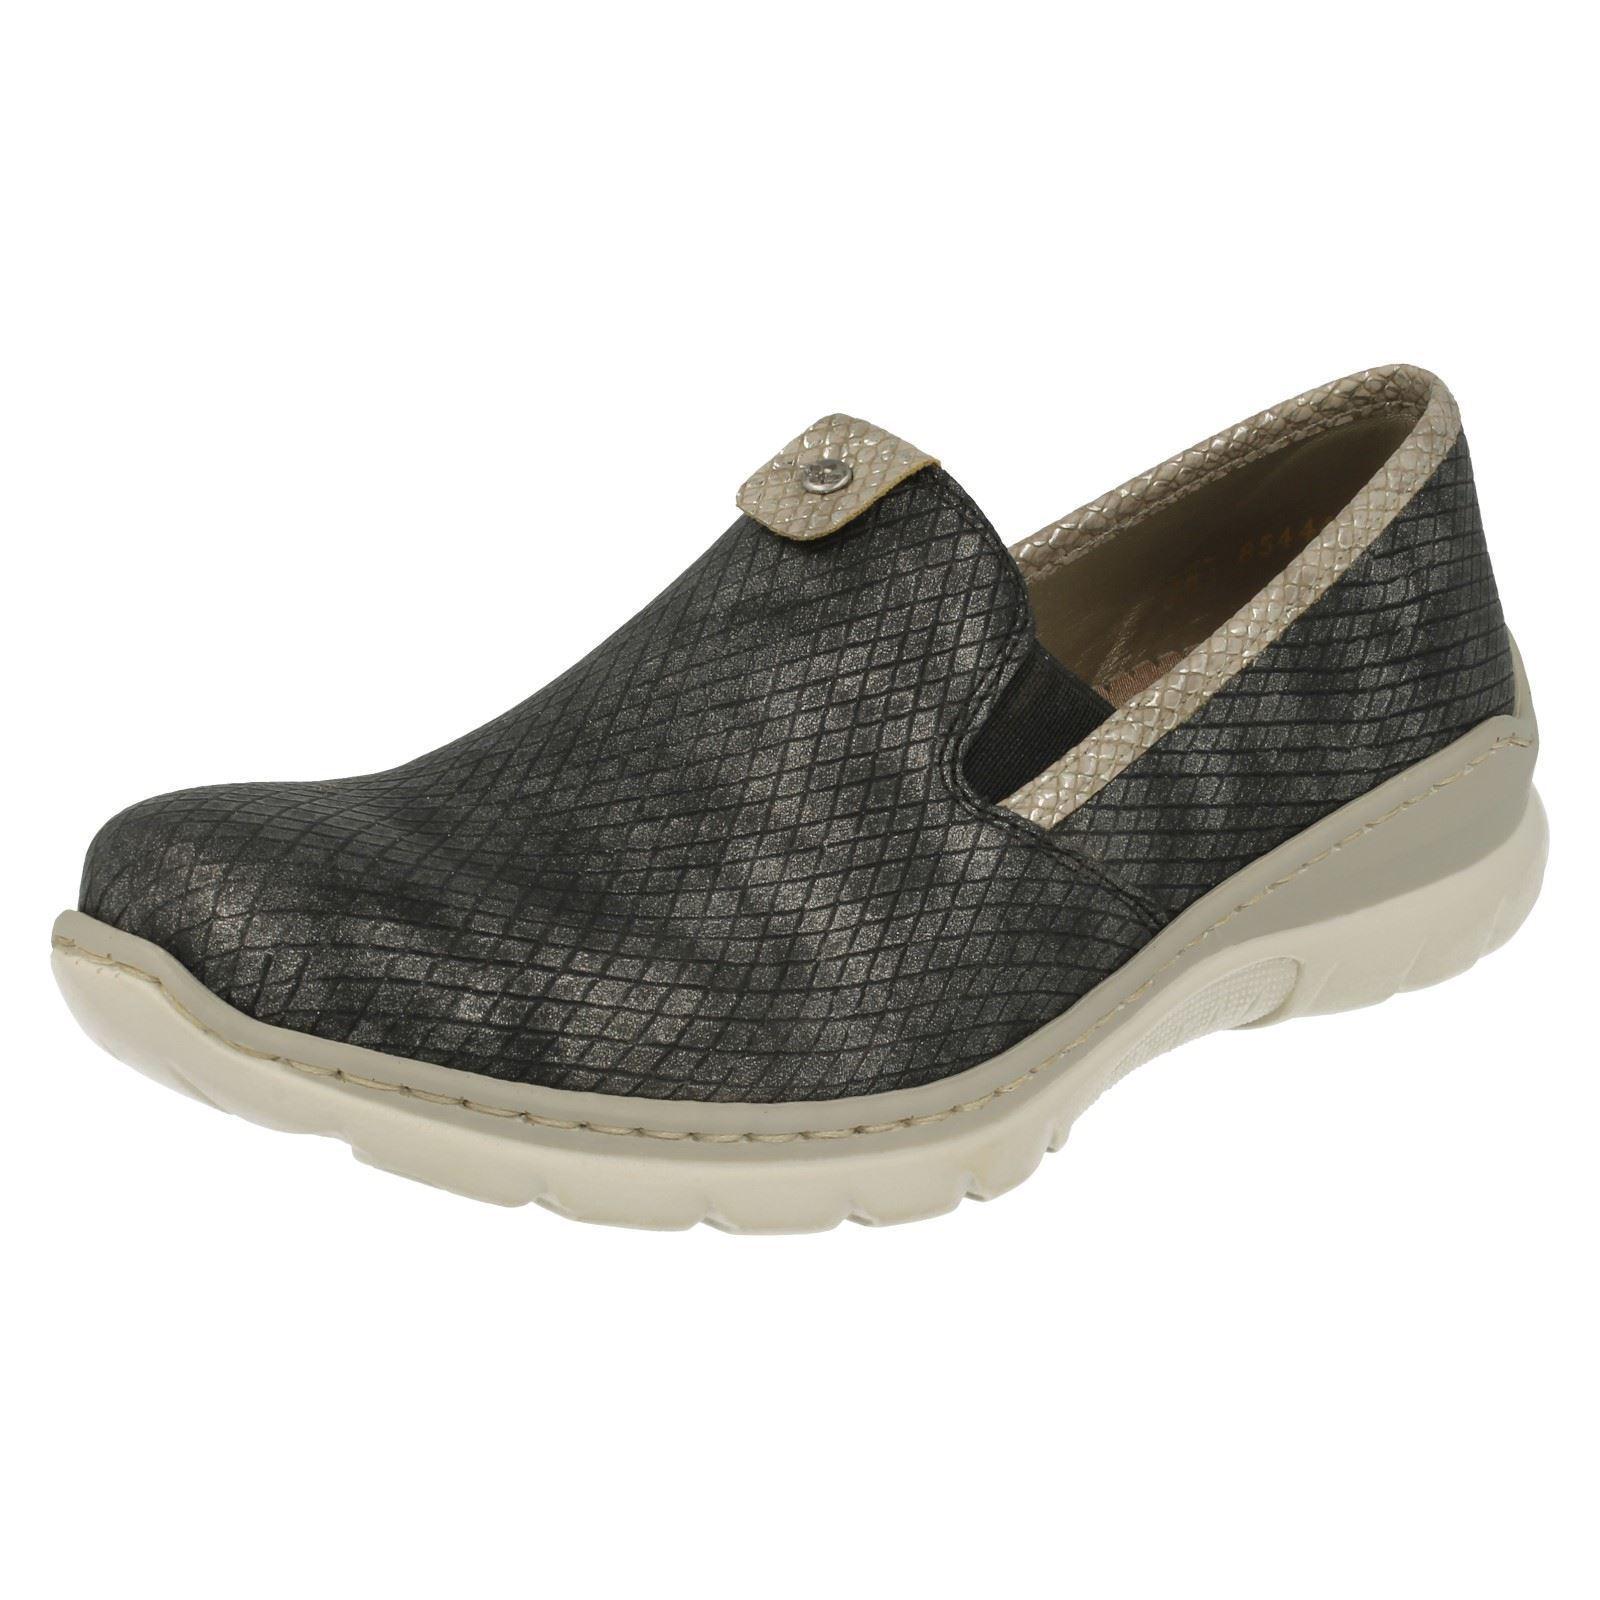 Damen Rieker L3272 MemoSoft grau Kombination Freizeit Slipper MemoSoft L3272 Schuhe 36e4d3